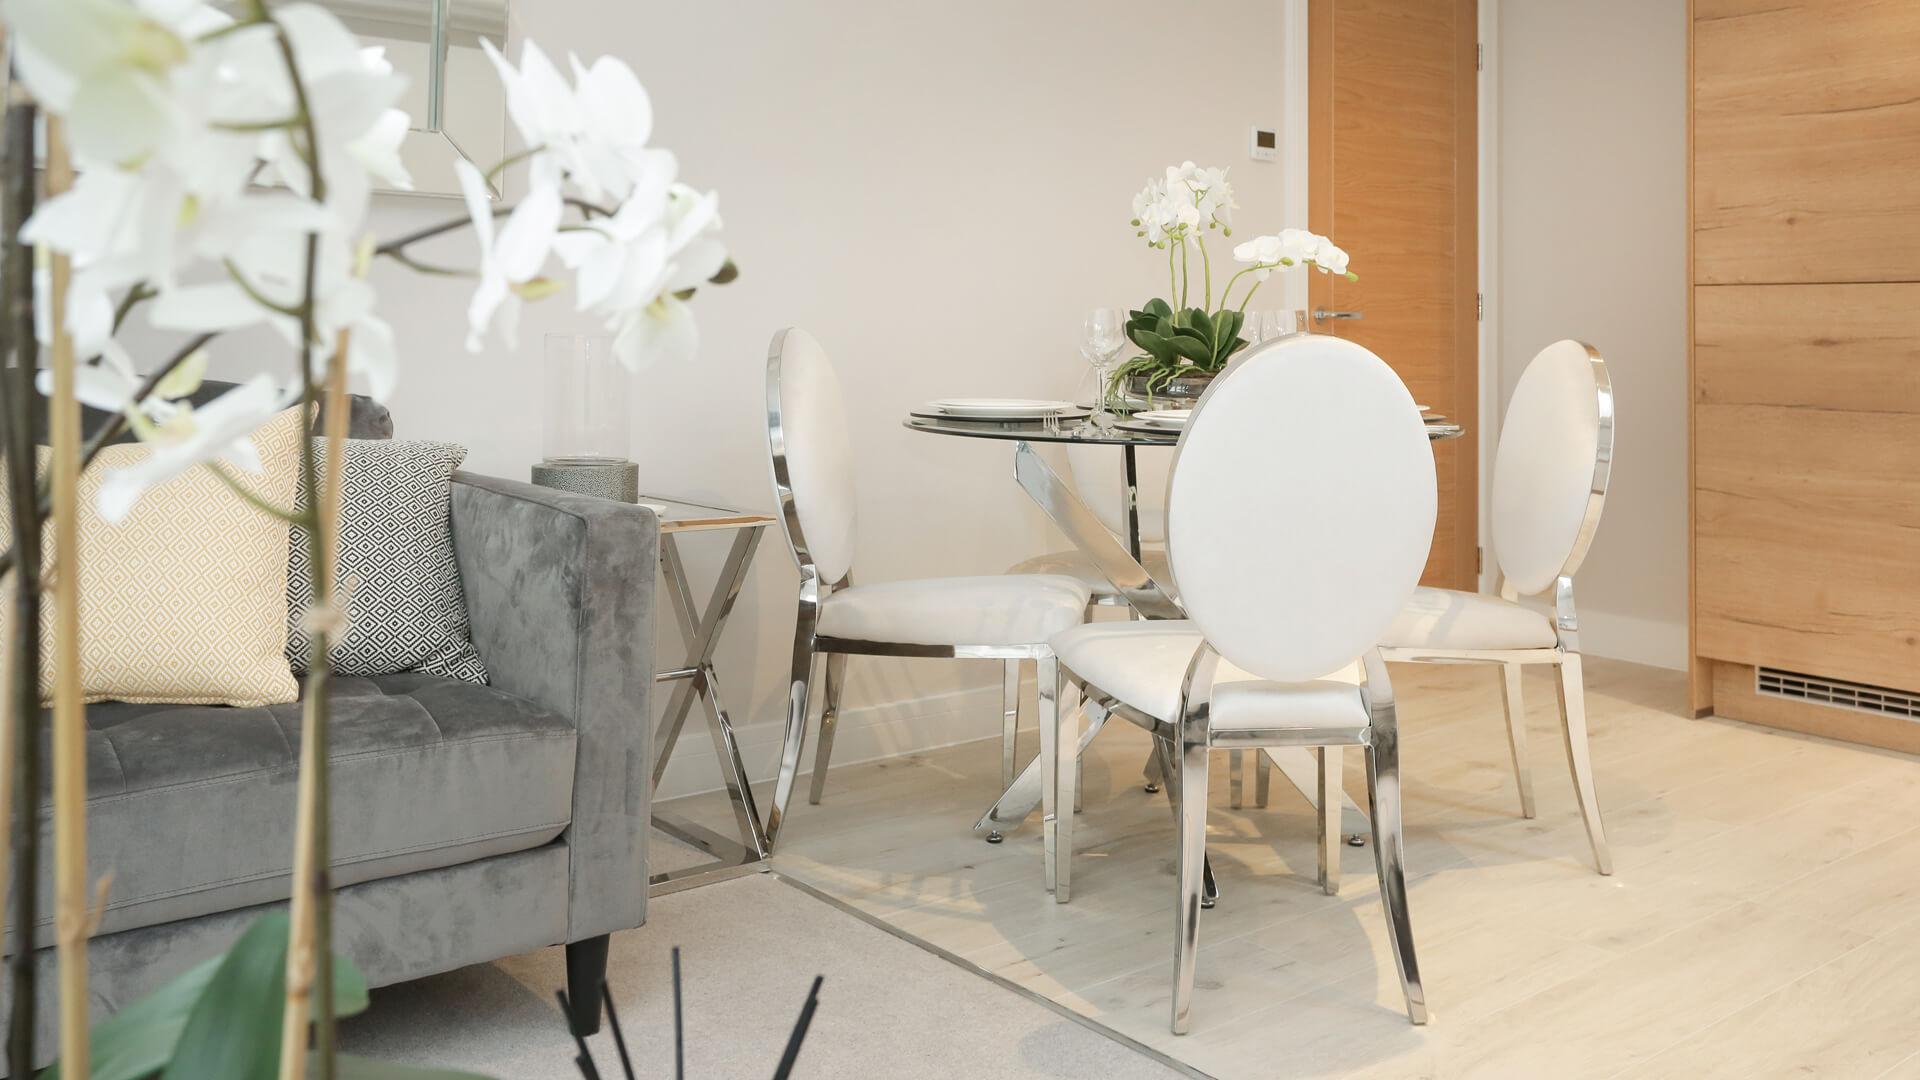 Dining room furniture at Plot3 Churchfields